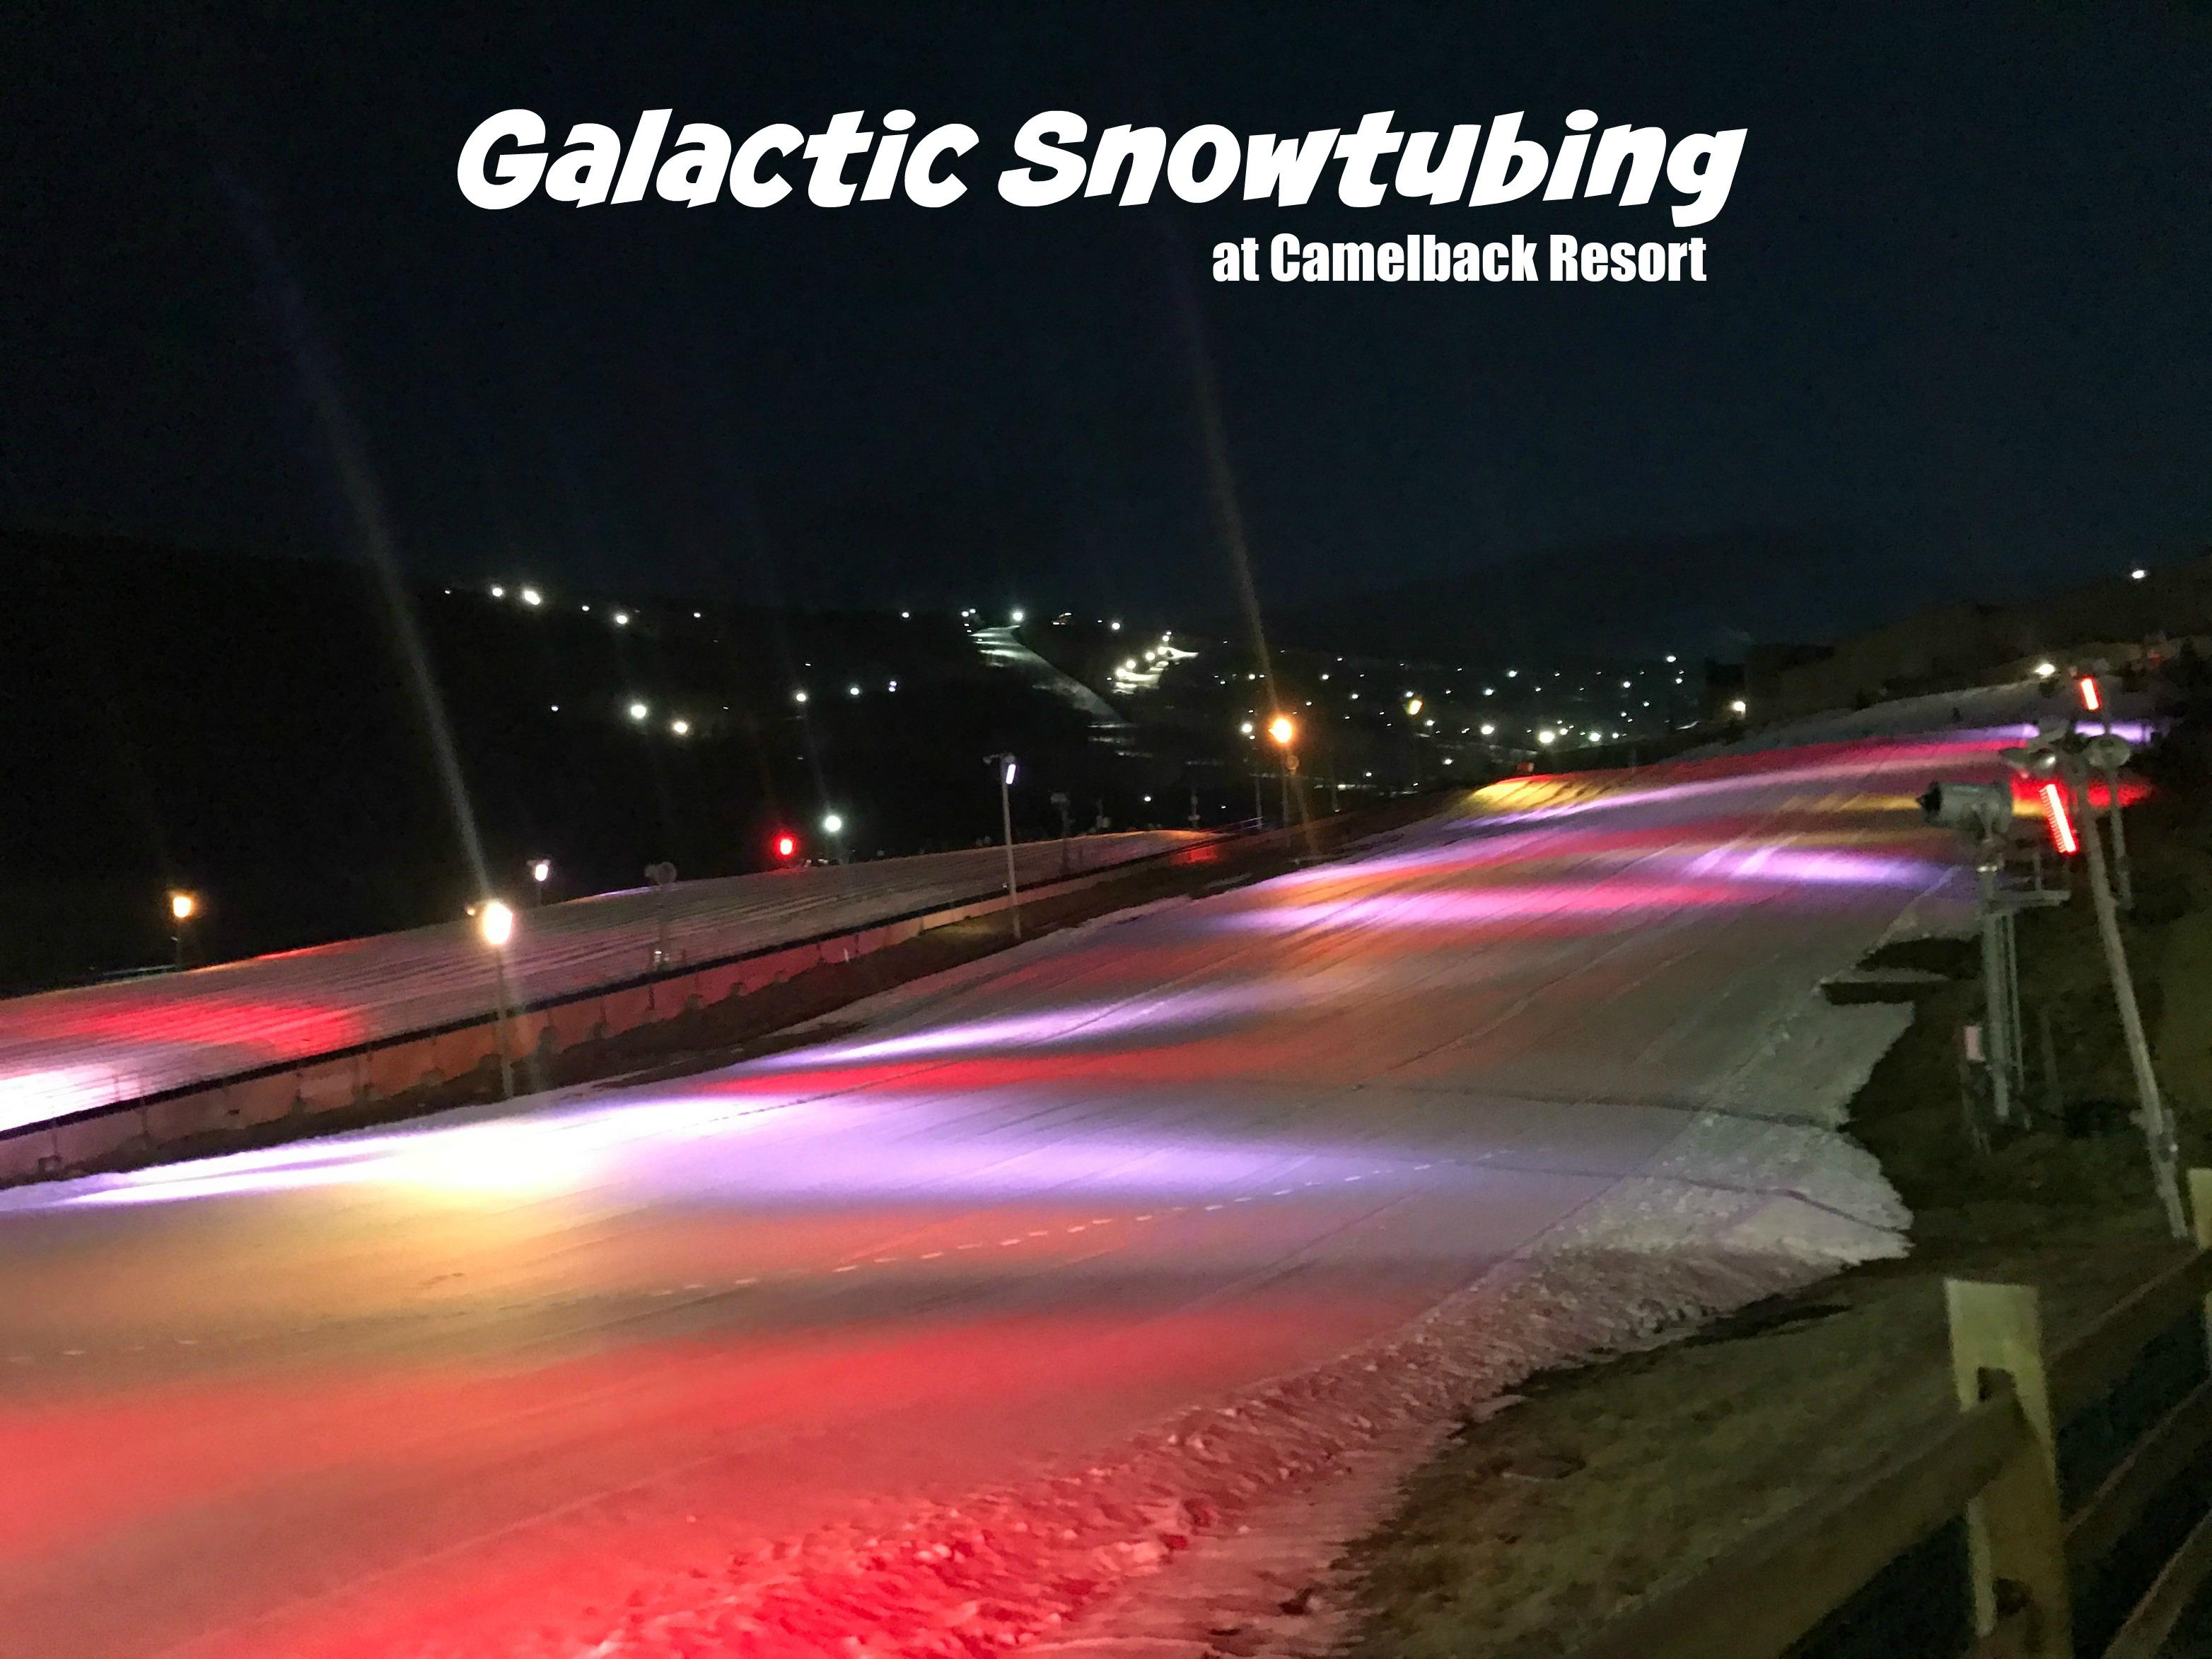 Galactic Snow Tubing at Camelback Mountain